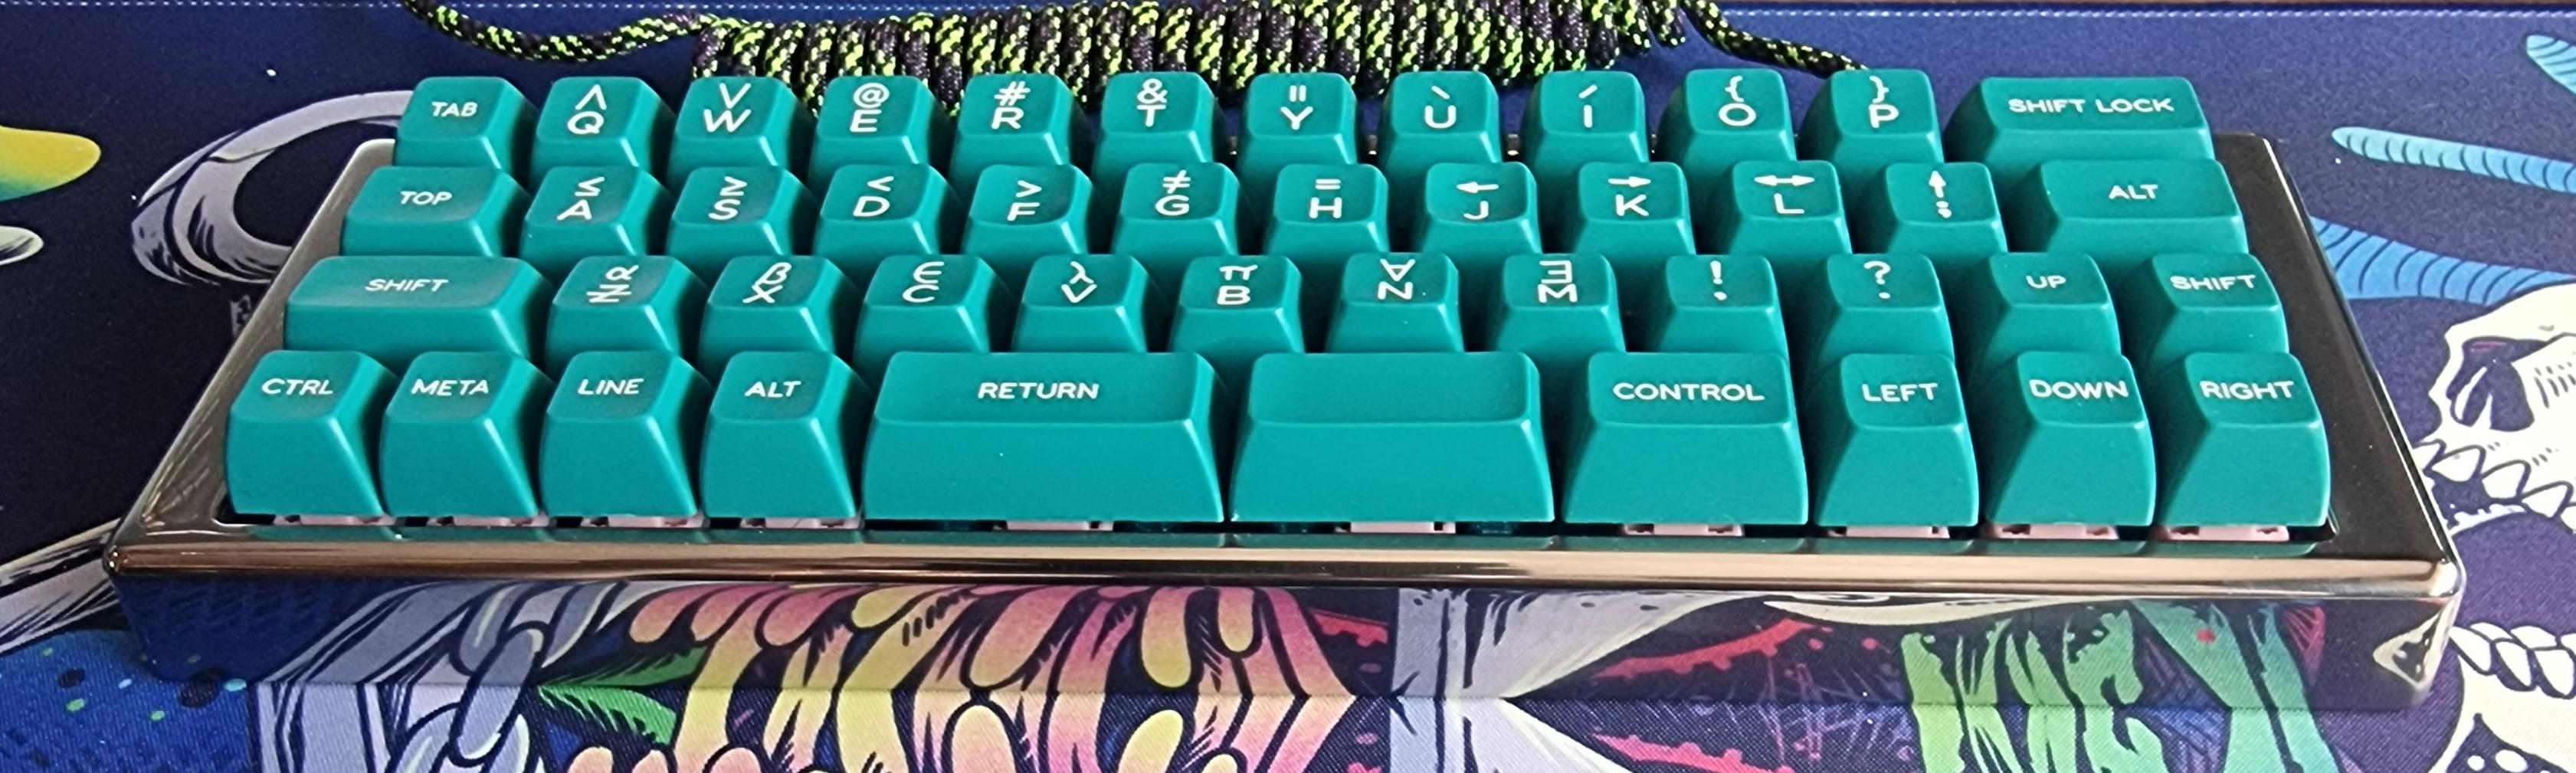 P⁴KCR3 FE with SA Sail keycaps